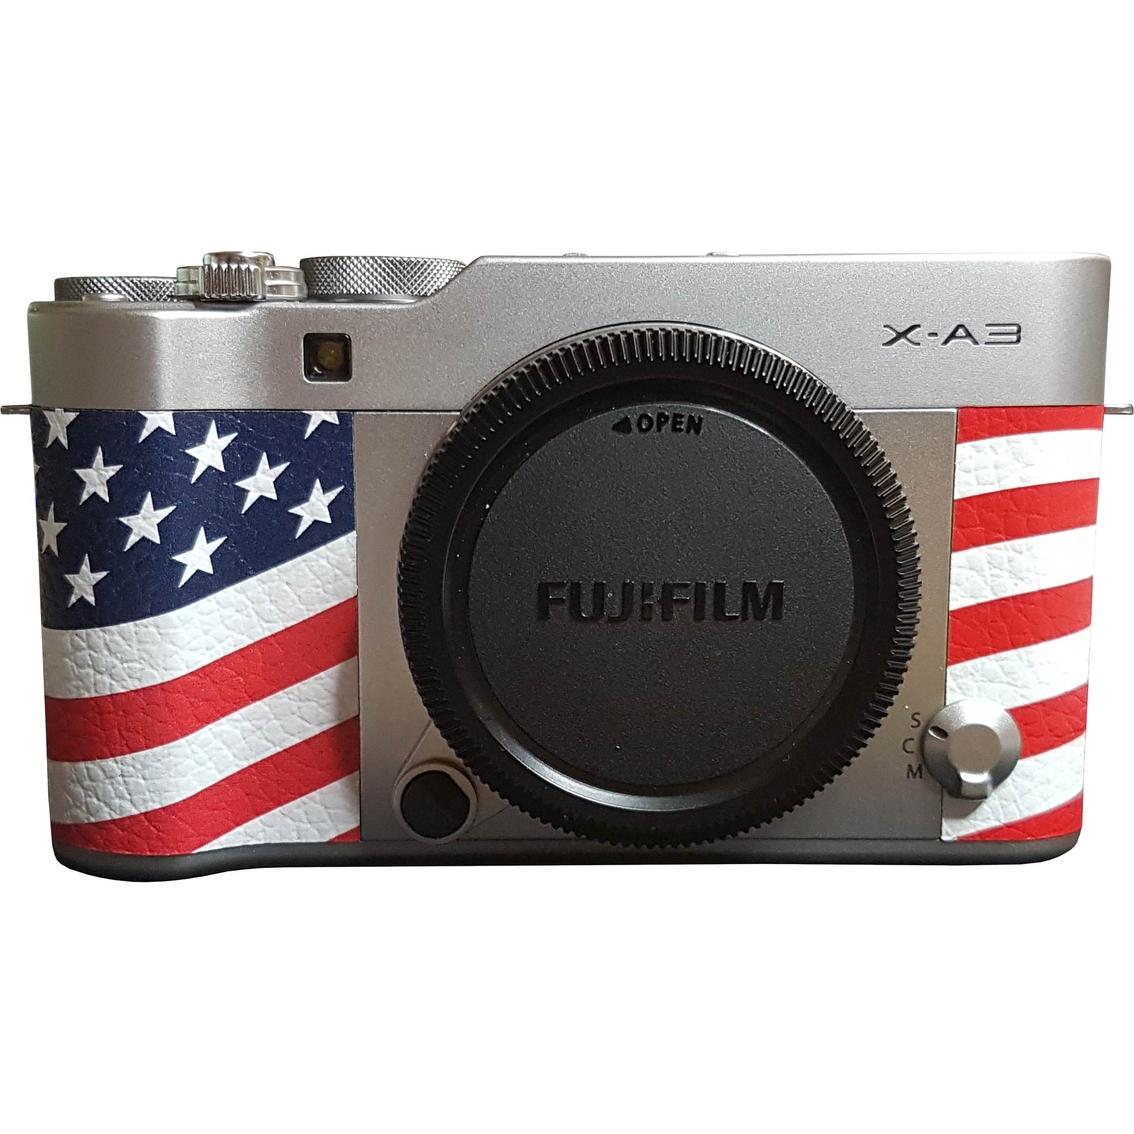 * AAFES / MILITARY ONLY * FujiFilm X-A3 MAB Mirrorless Digital Camera $199